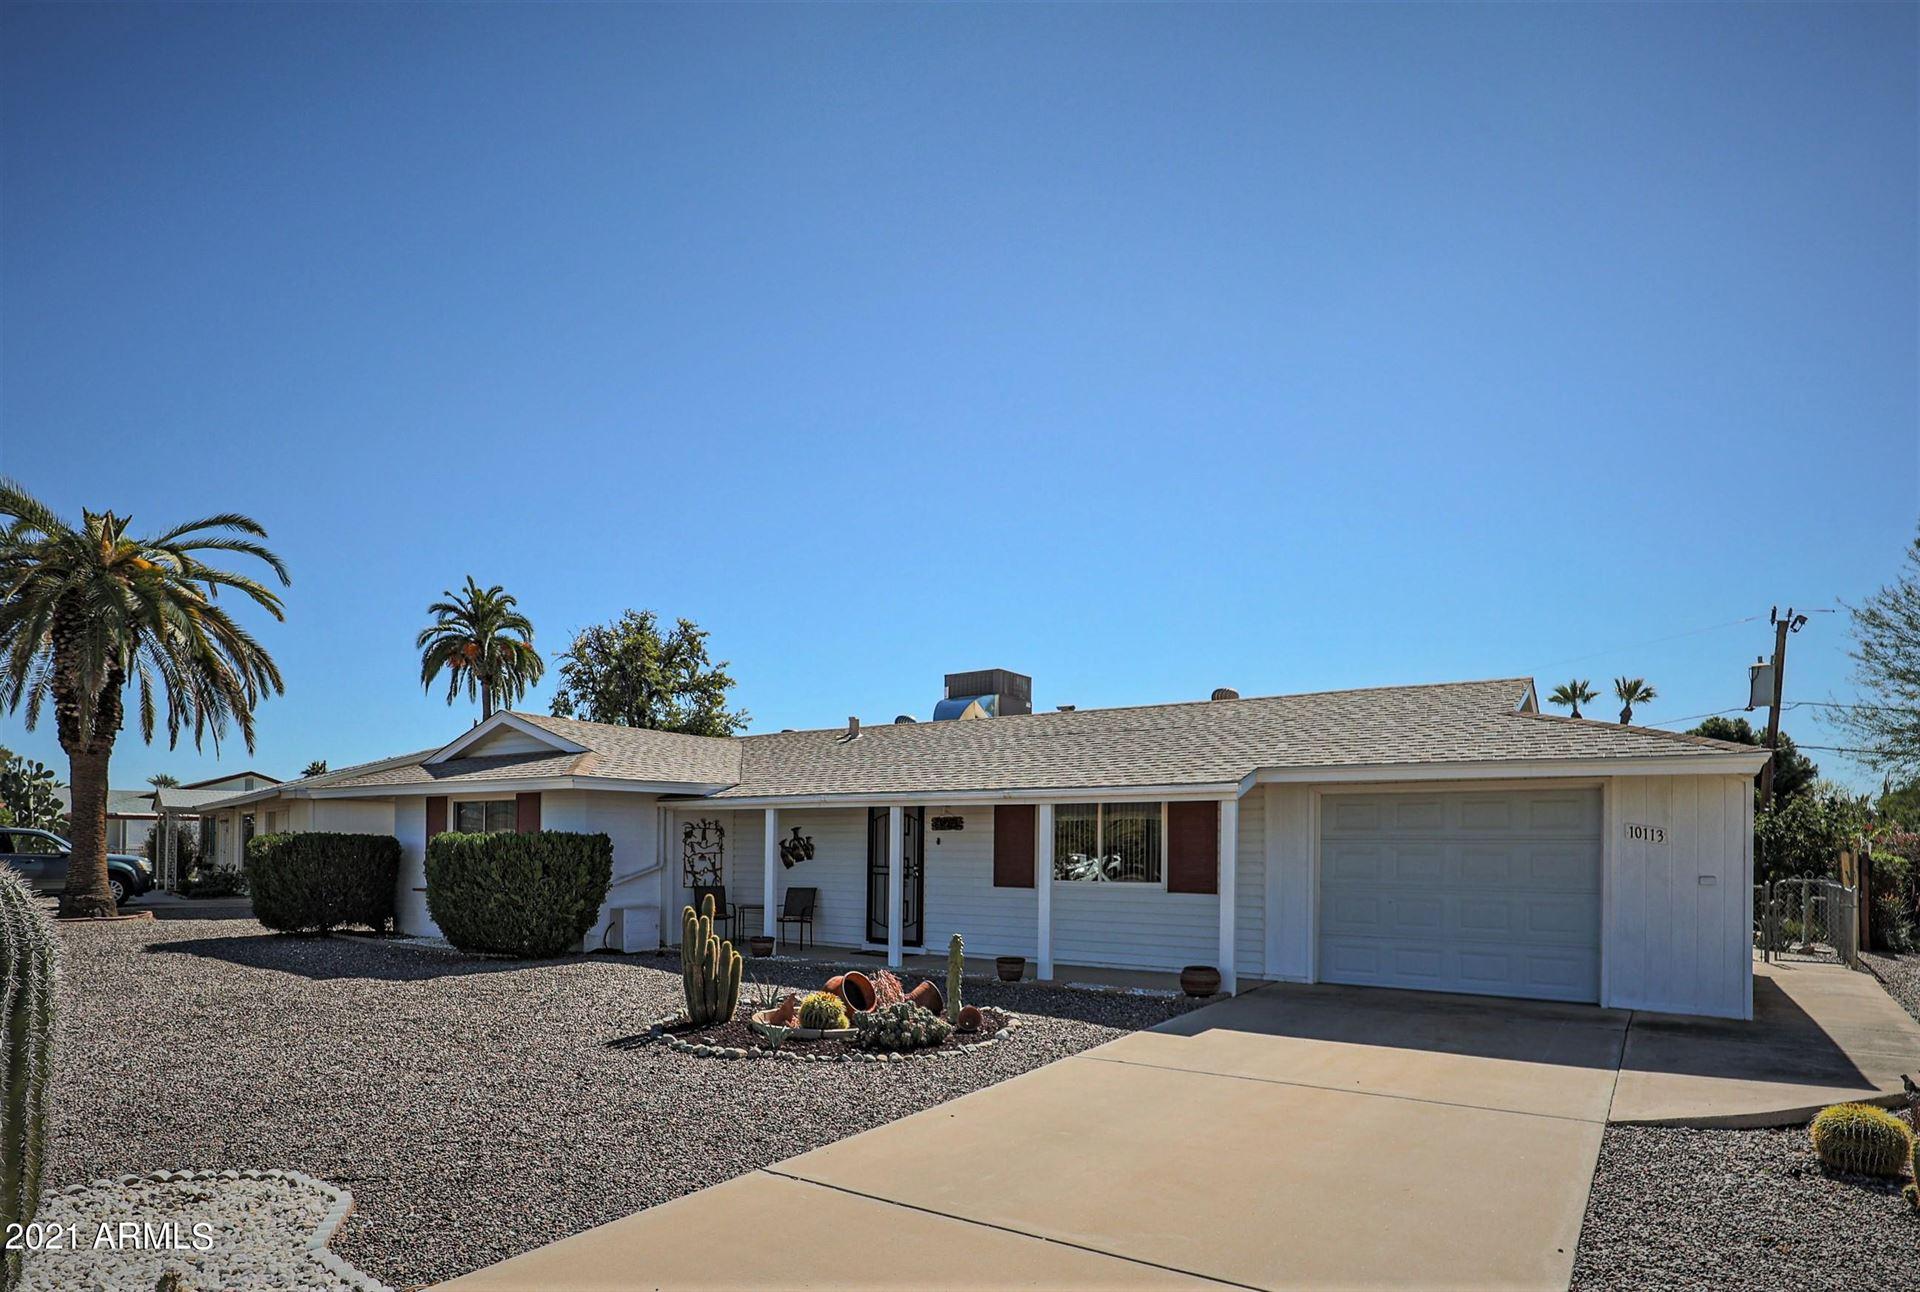 Photo of 10113 W PEBBLE BEACH Drive, Sun City, AZ 85351 (MLS # 6200461)